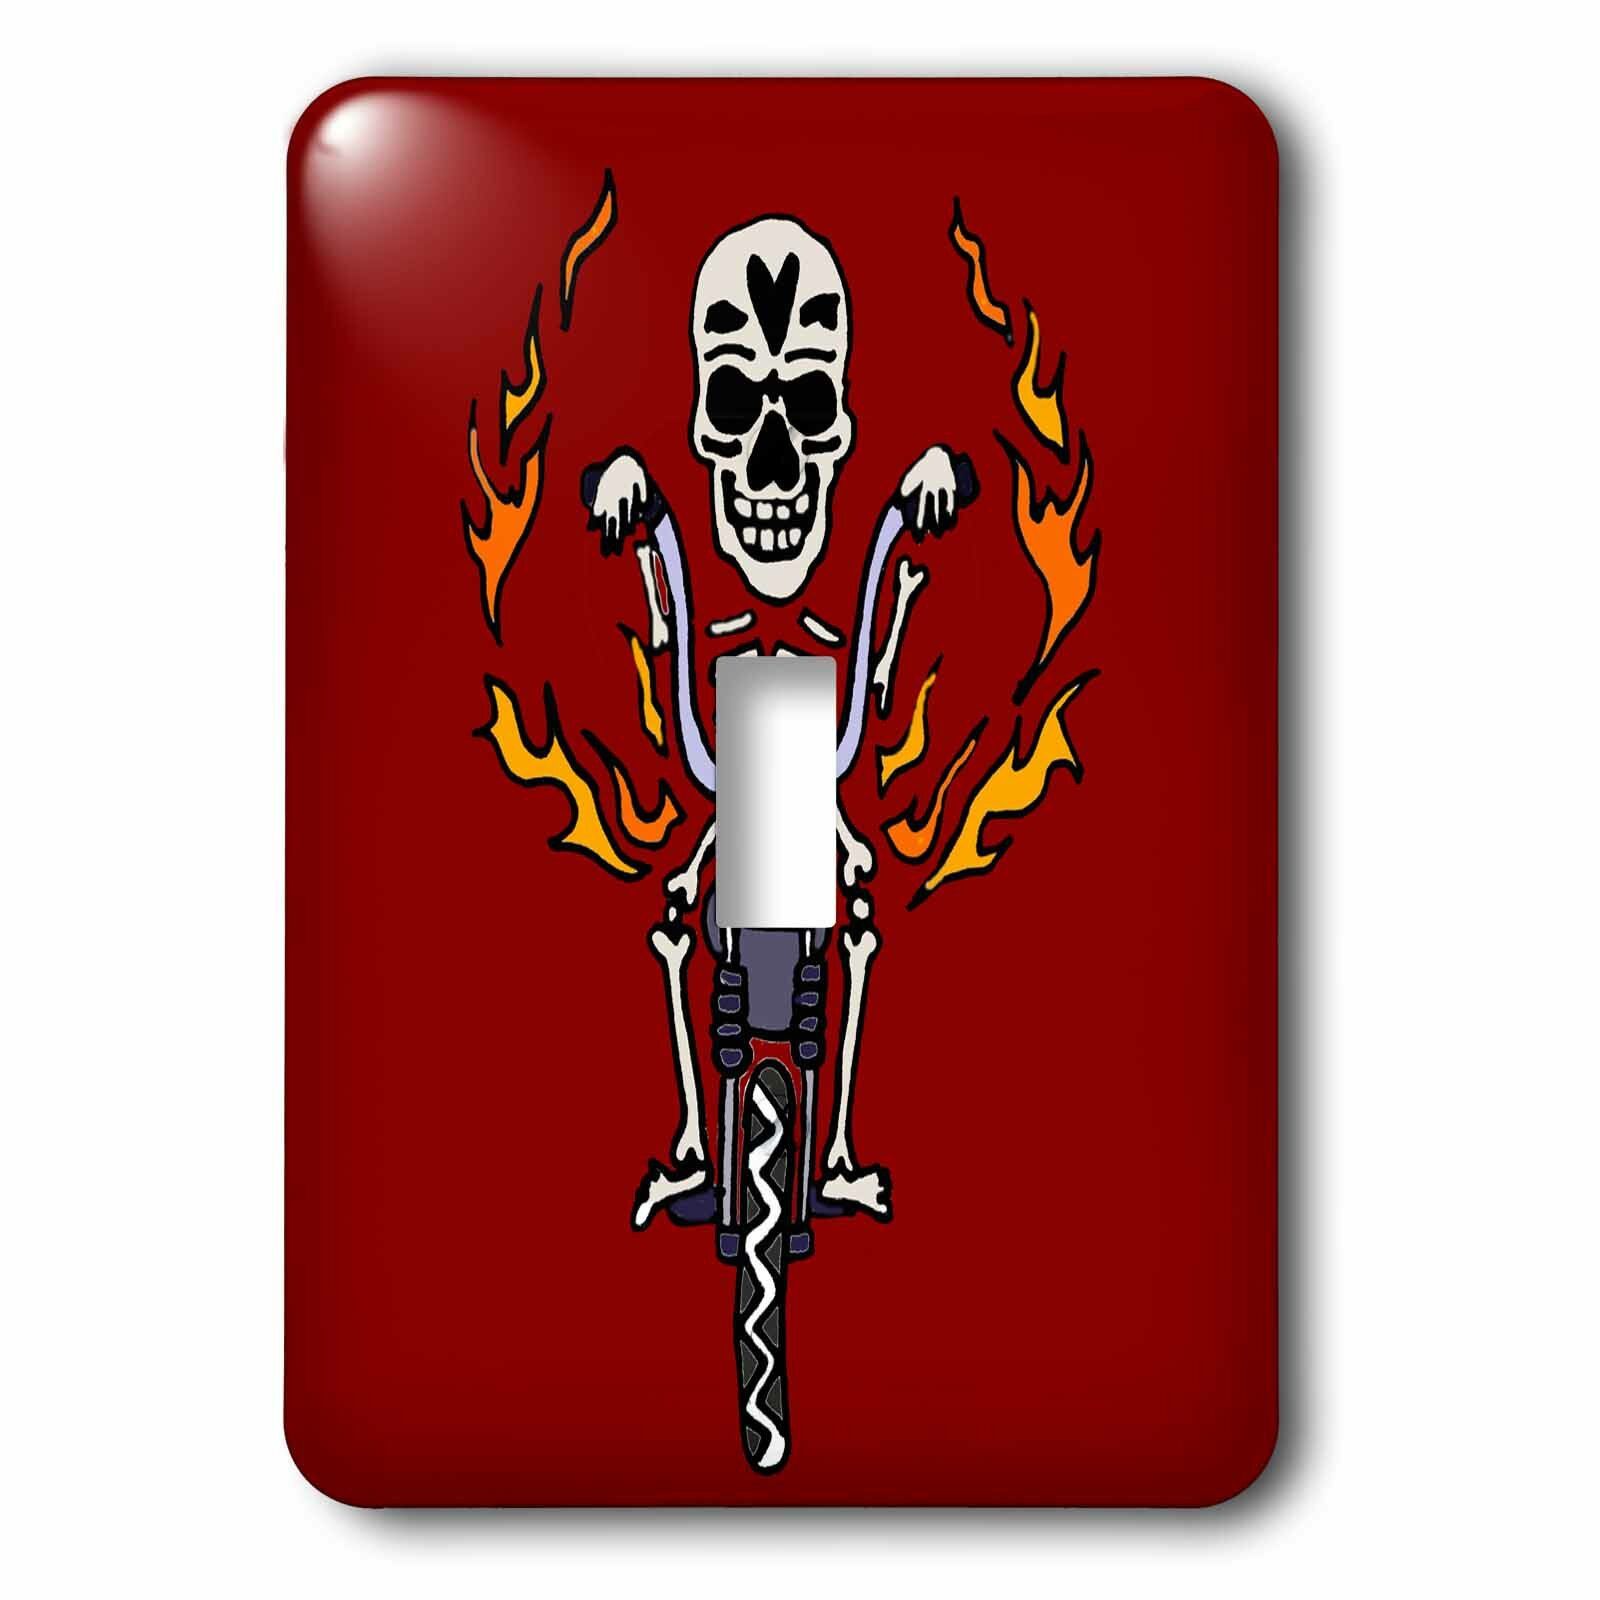 3drose Skeleton Riding Motorcycle 1 Gang Toggle Light Switch Wall Plate Wayfair